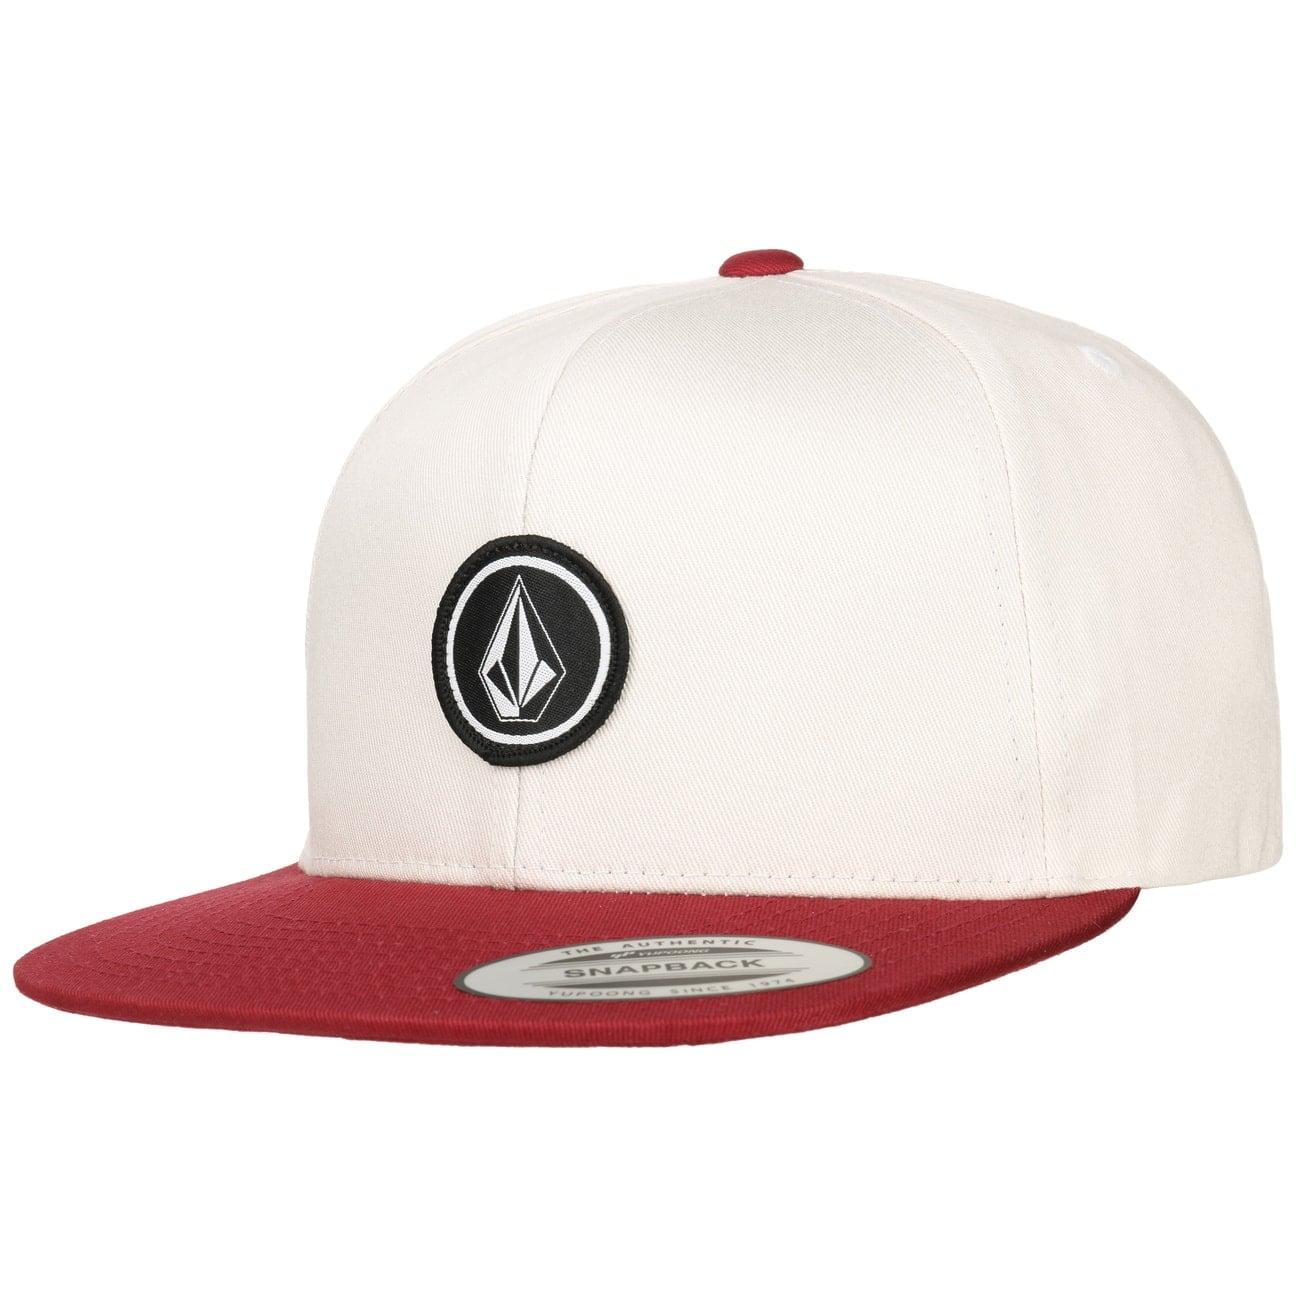 Casquette Quarter Twill Snapback by Volcom  baseball cap